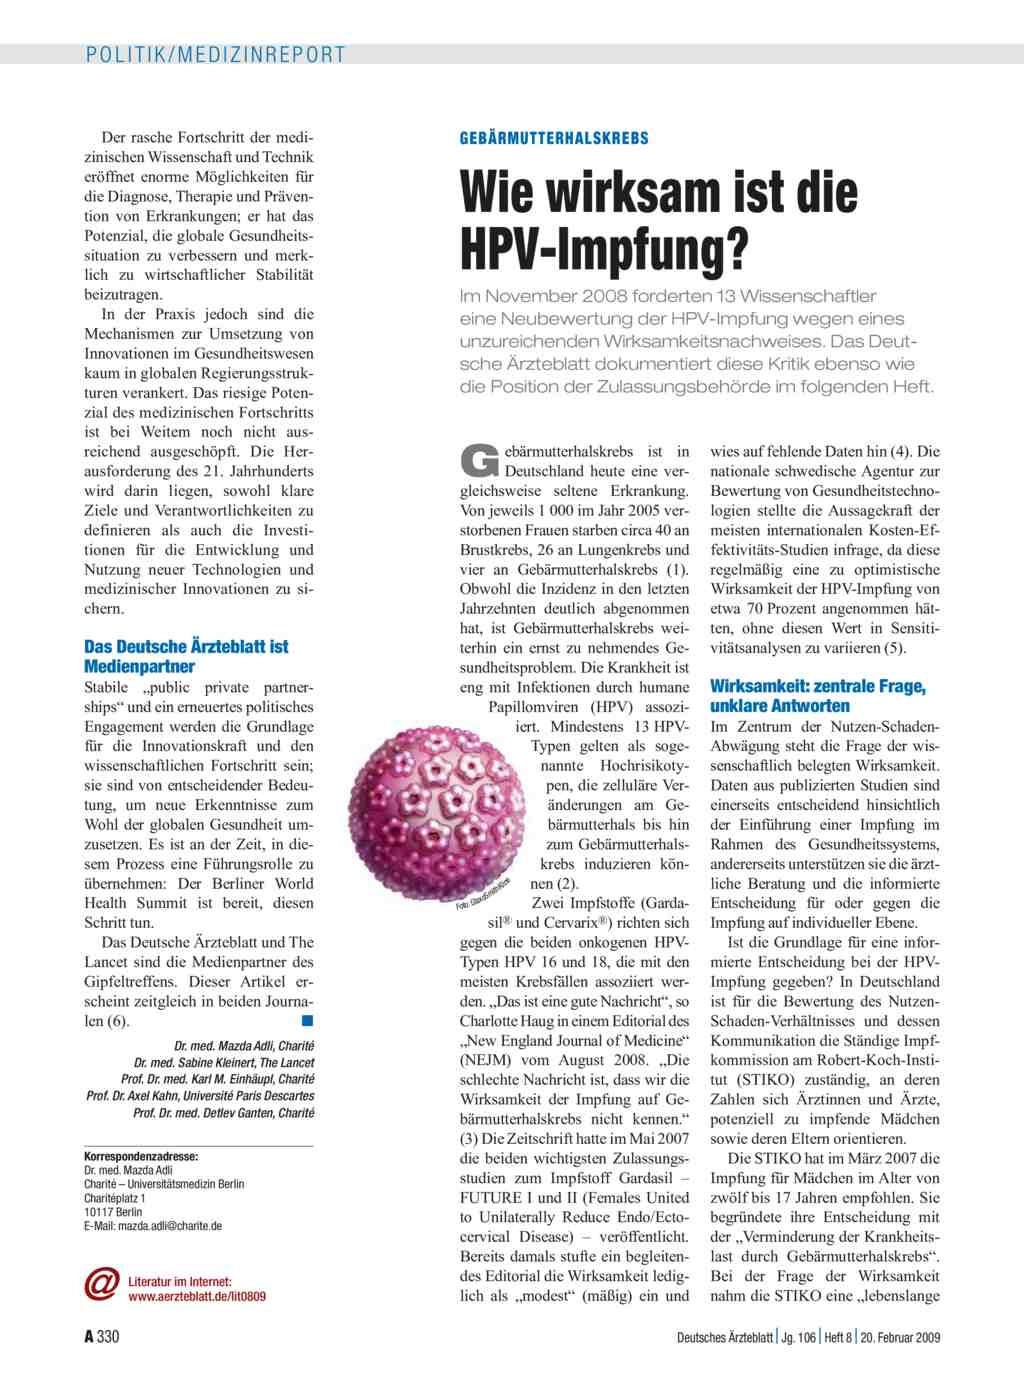 hpv impfung empfehlung)